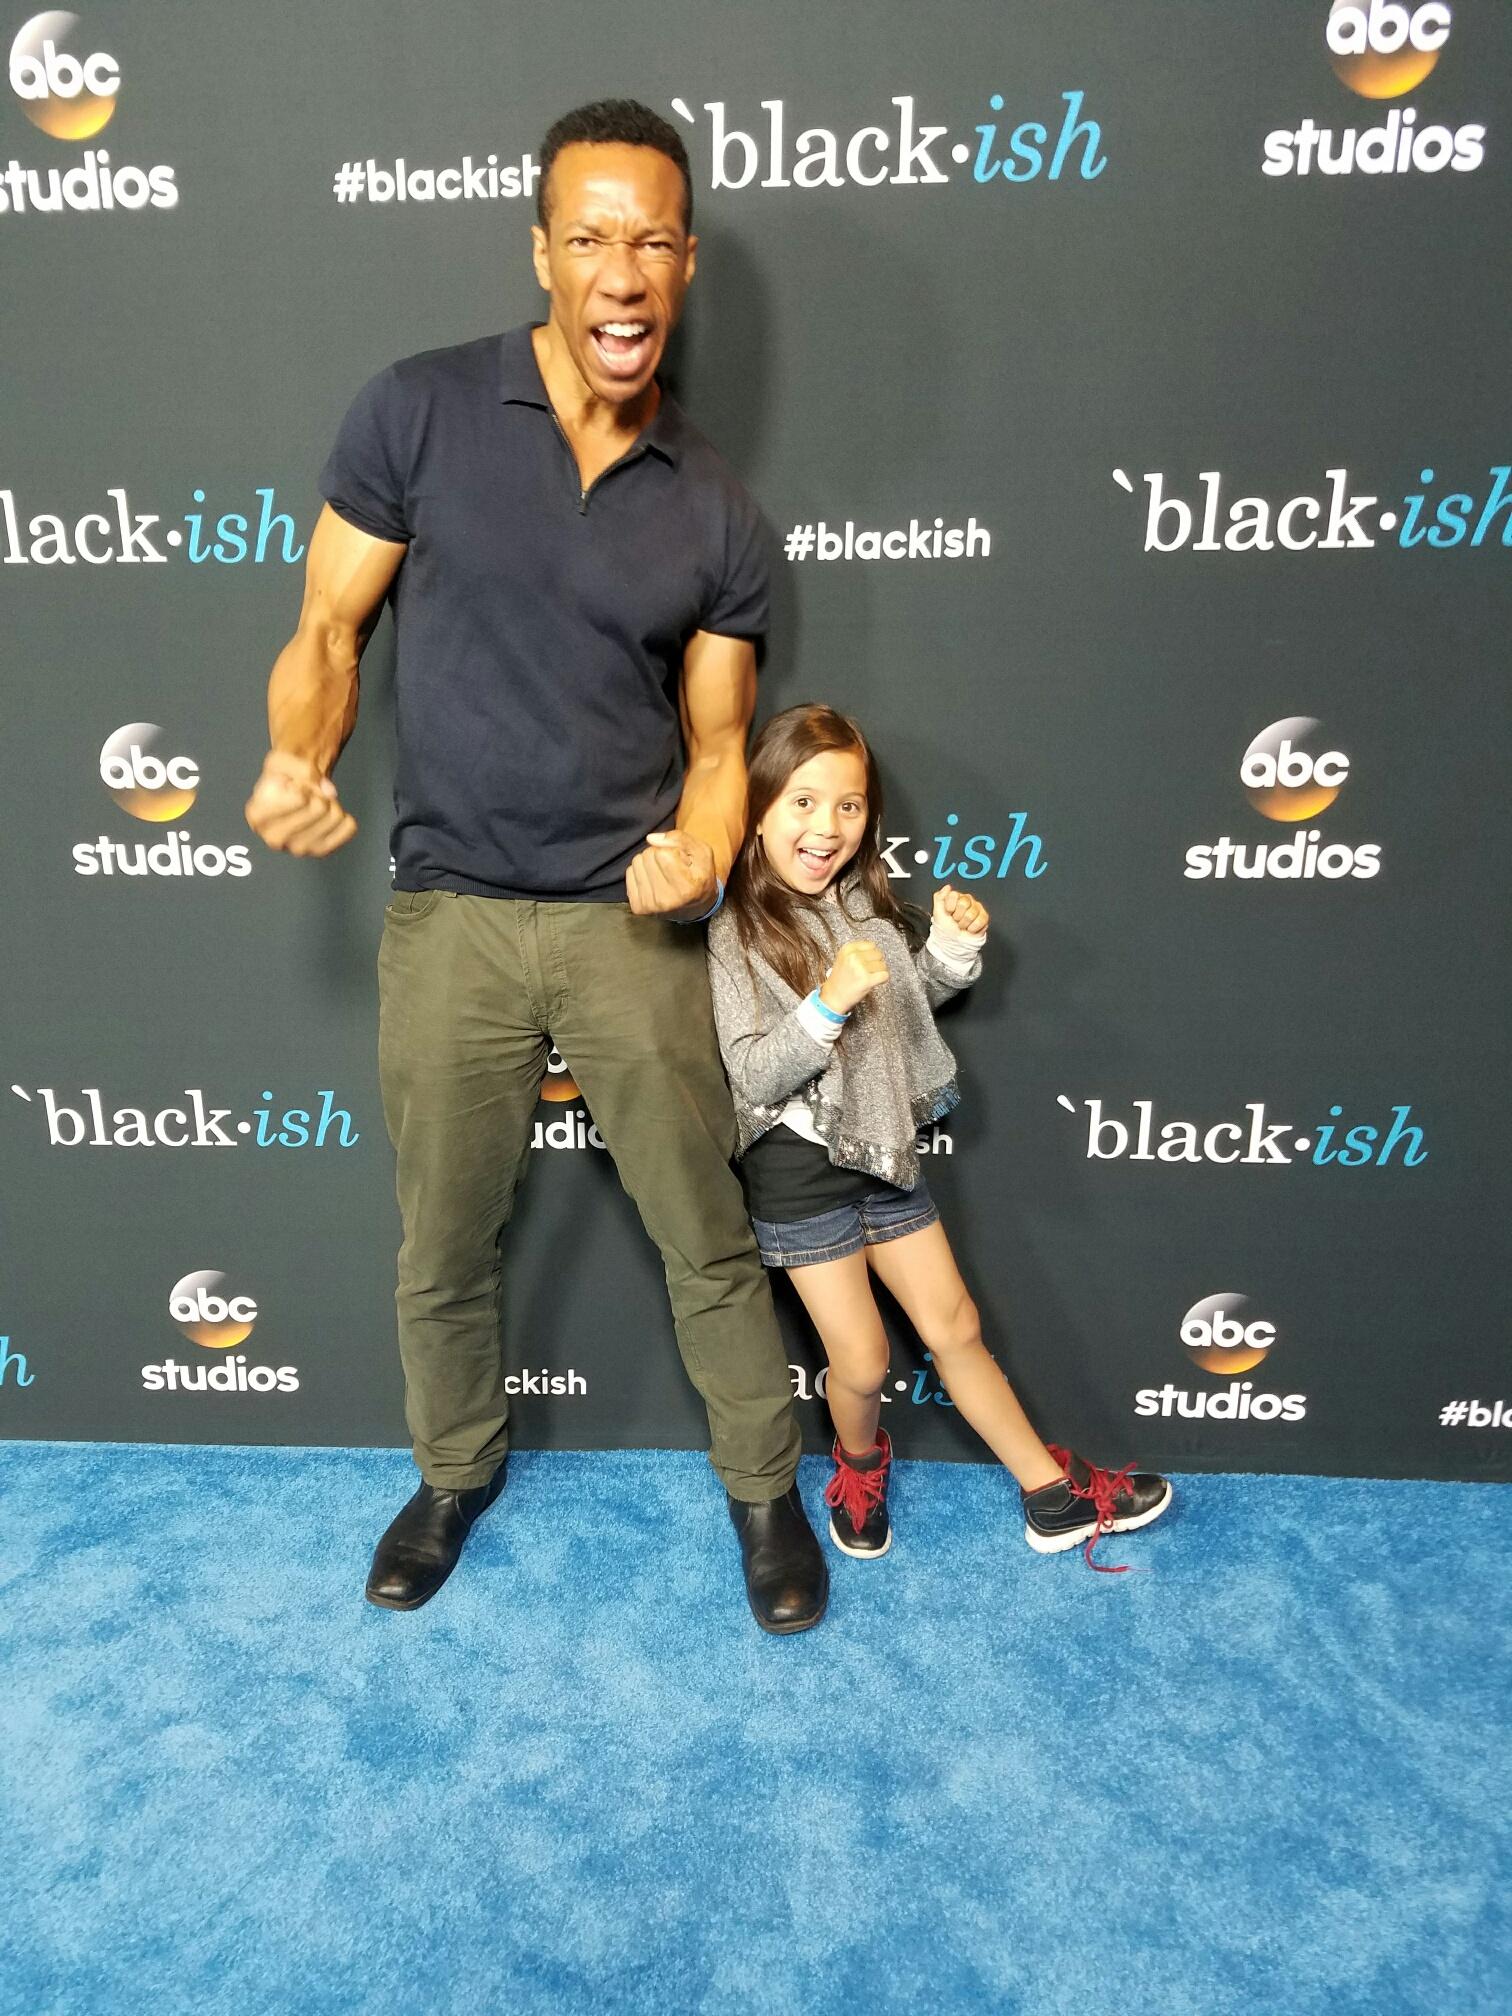 BLACKISH Emmy screening and Q&A